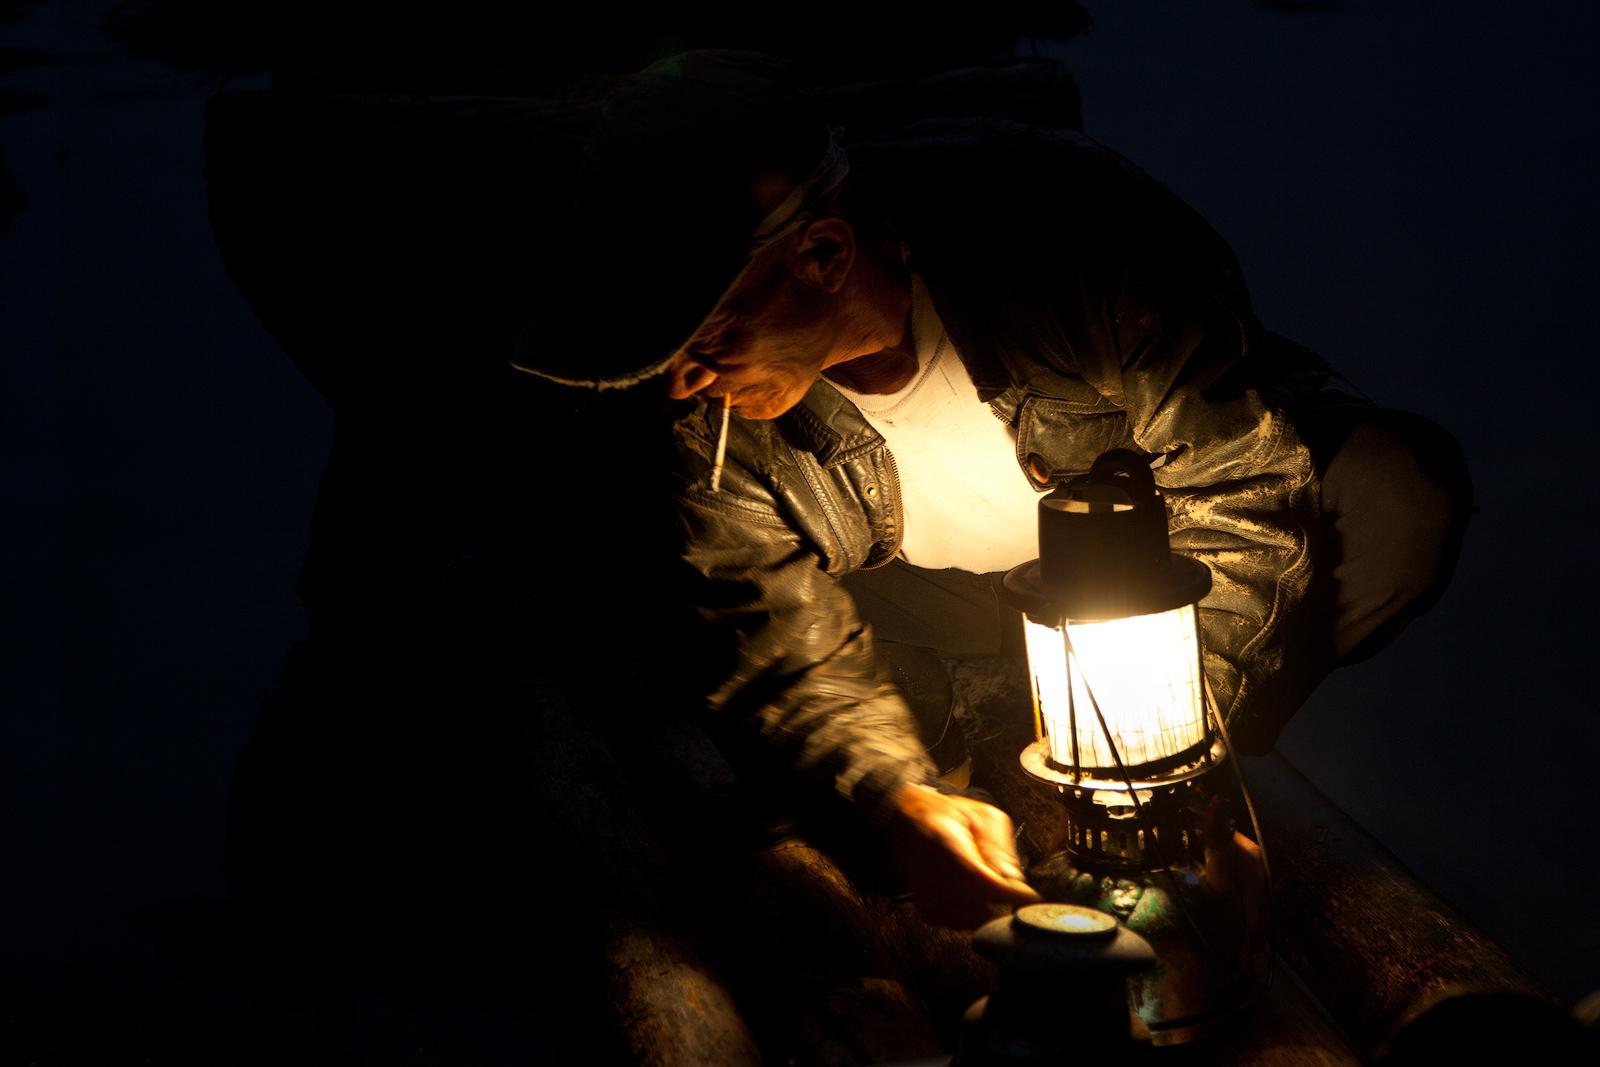 asia,china,chinese,cormorant,dark,fish,fisherman,fishing,guilin,holding,horizontal,household,lamp,lantern,li river,mor, photo